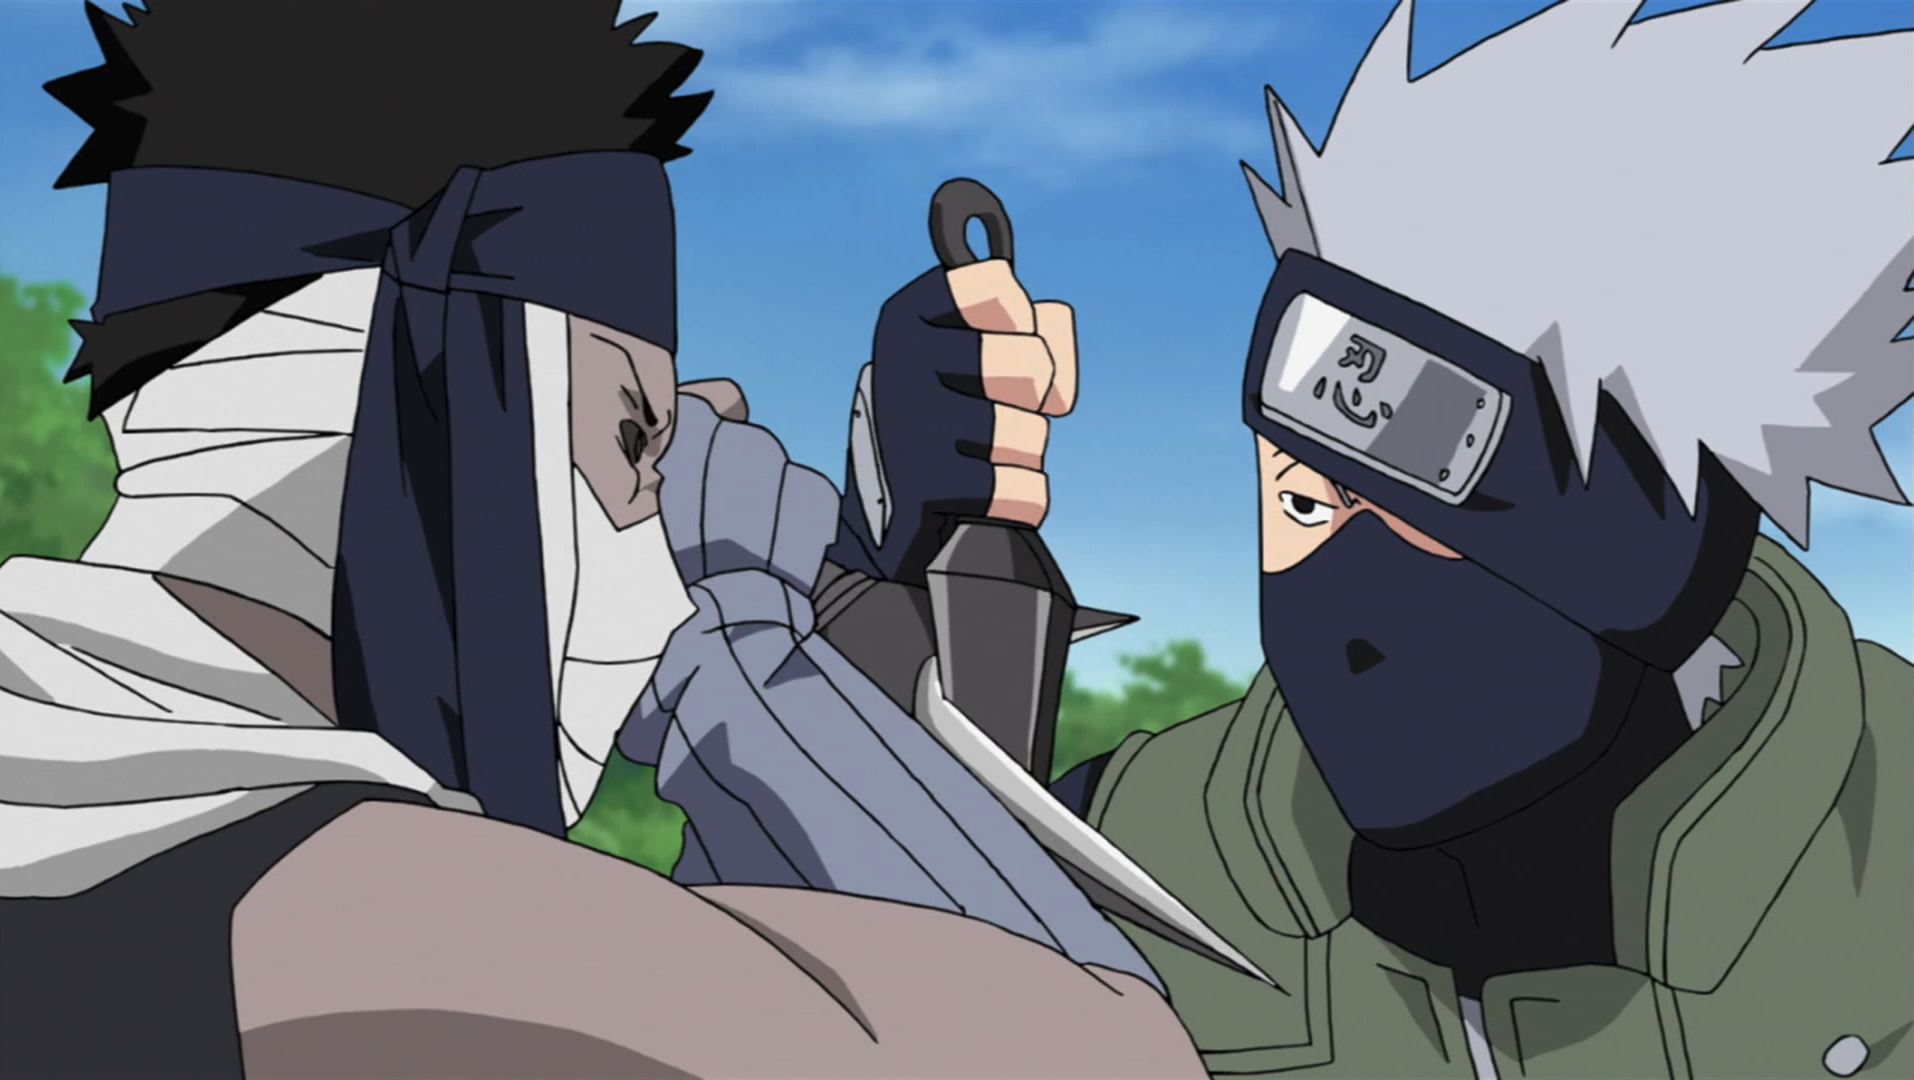 An Old Nemesis Returns | Narutopedia | FANDOM powered by Wikia